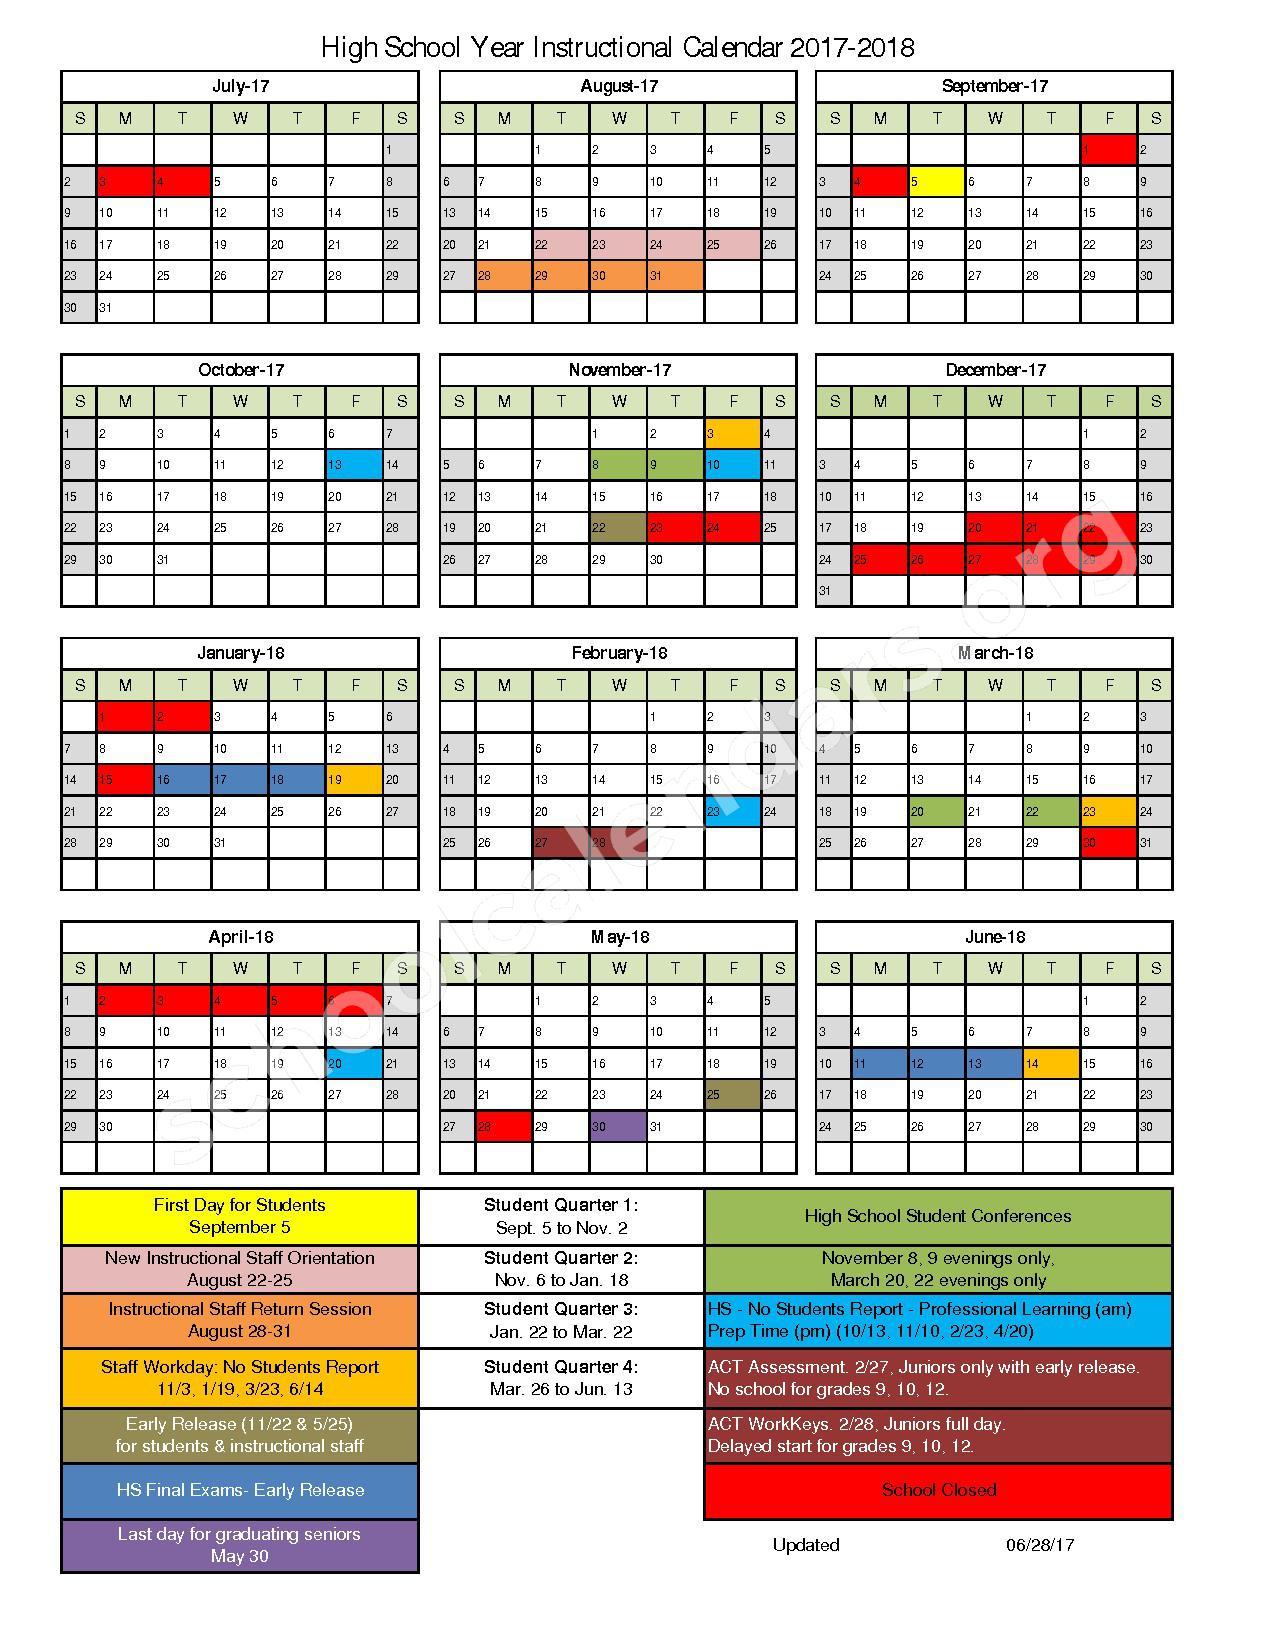 2017 - 2018 High School Instructional Calendar – Kenosha School District – page 1